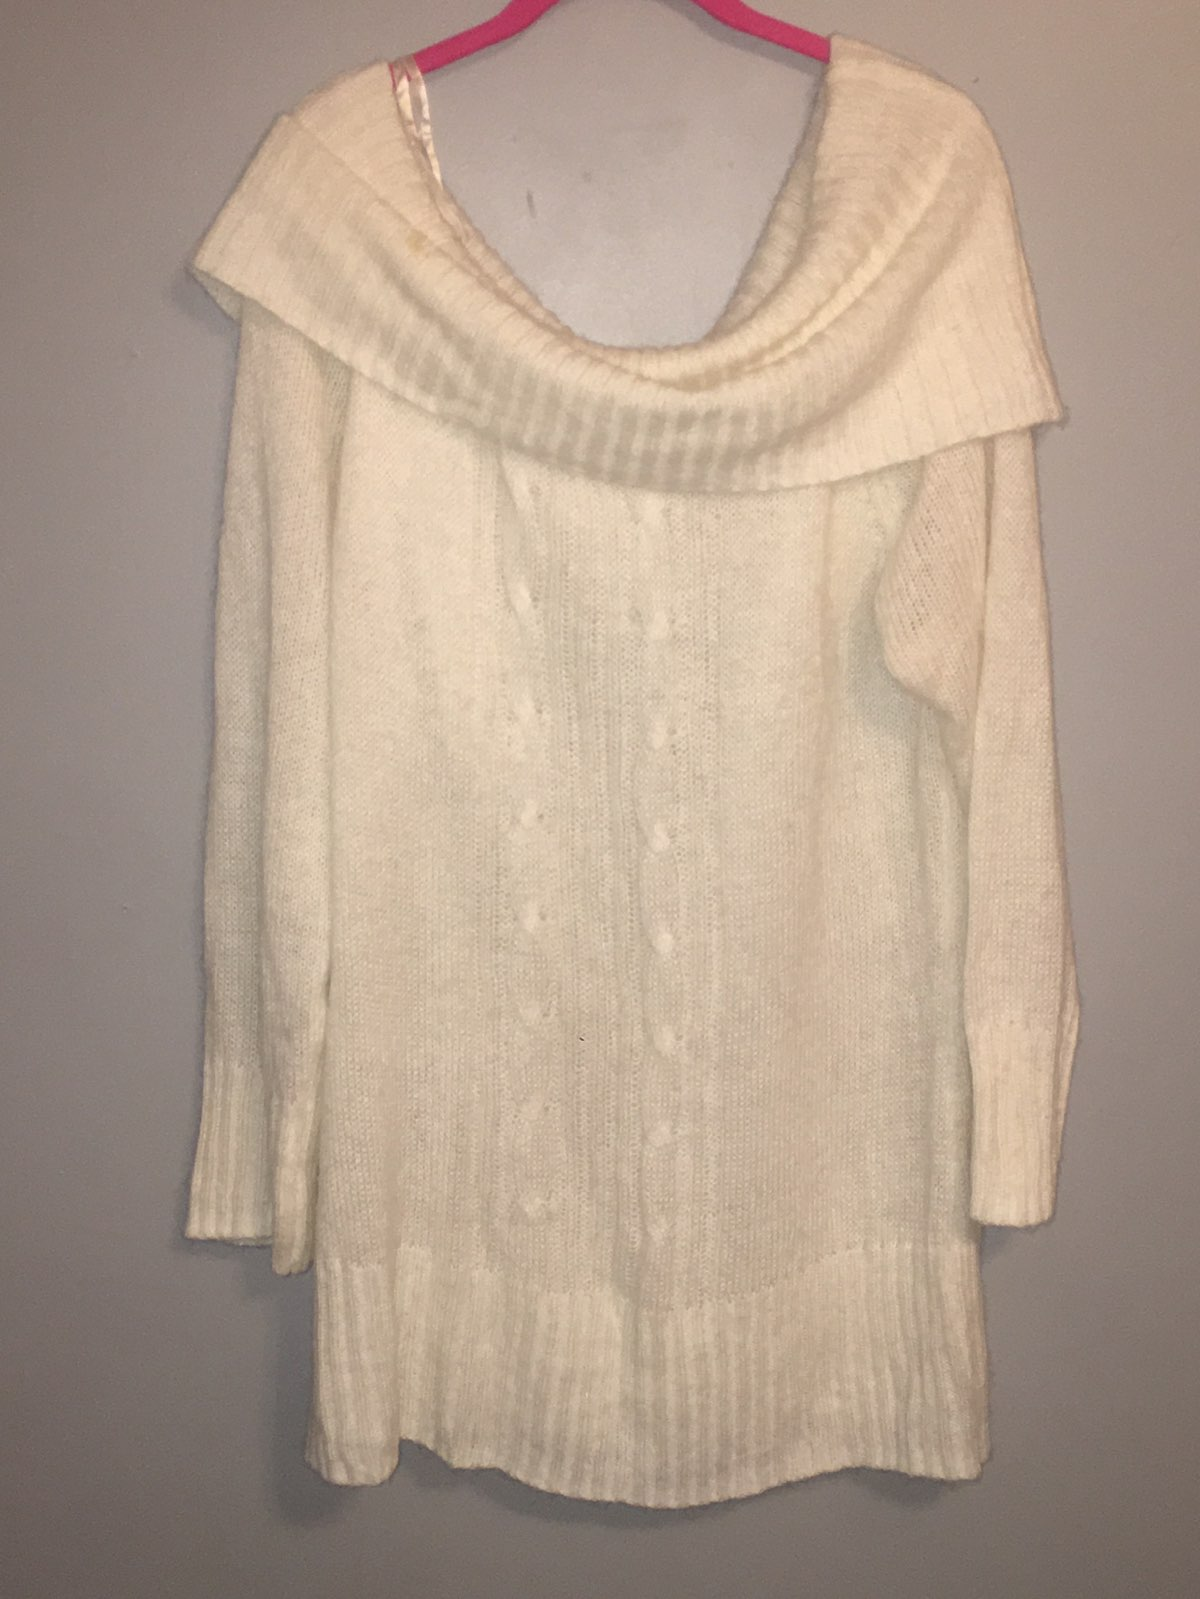 Superrr Cute Sweater - Mercari: BUY & SELL THINGS YOU LOVE